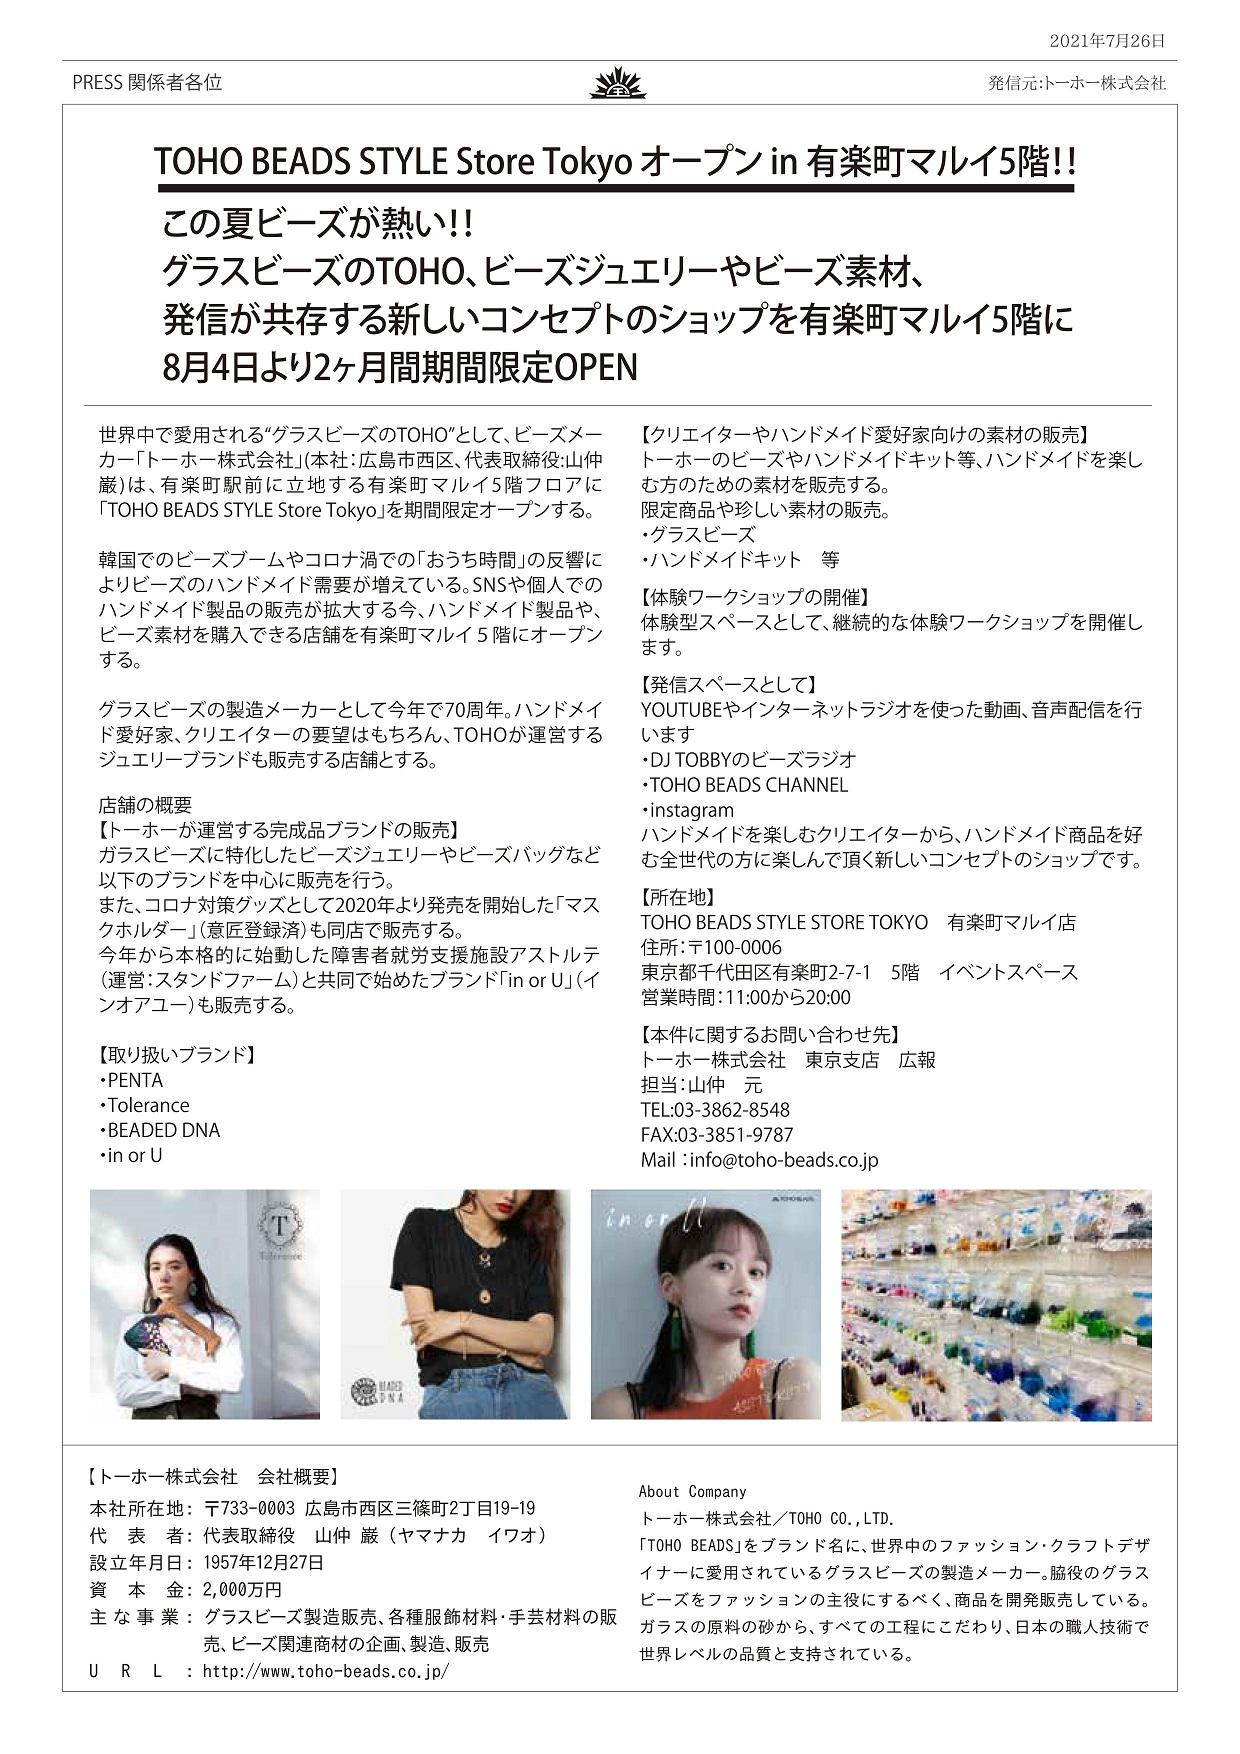 http://www.toho-beads.co.jp/information/news/assets_c/2021/07/p_20210726_01-thumb-1240x1754-9106.jpg